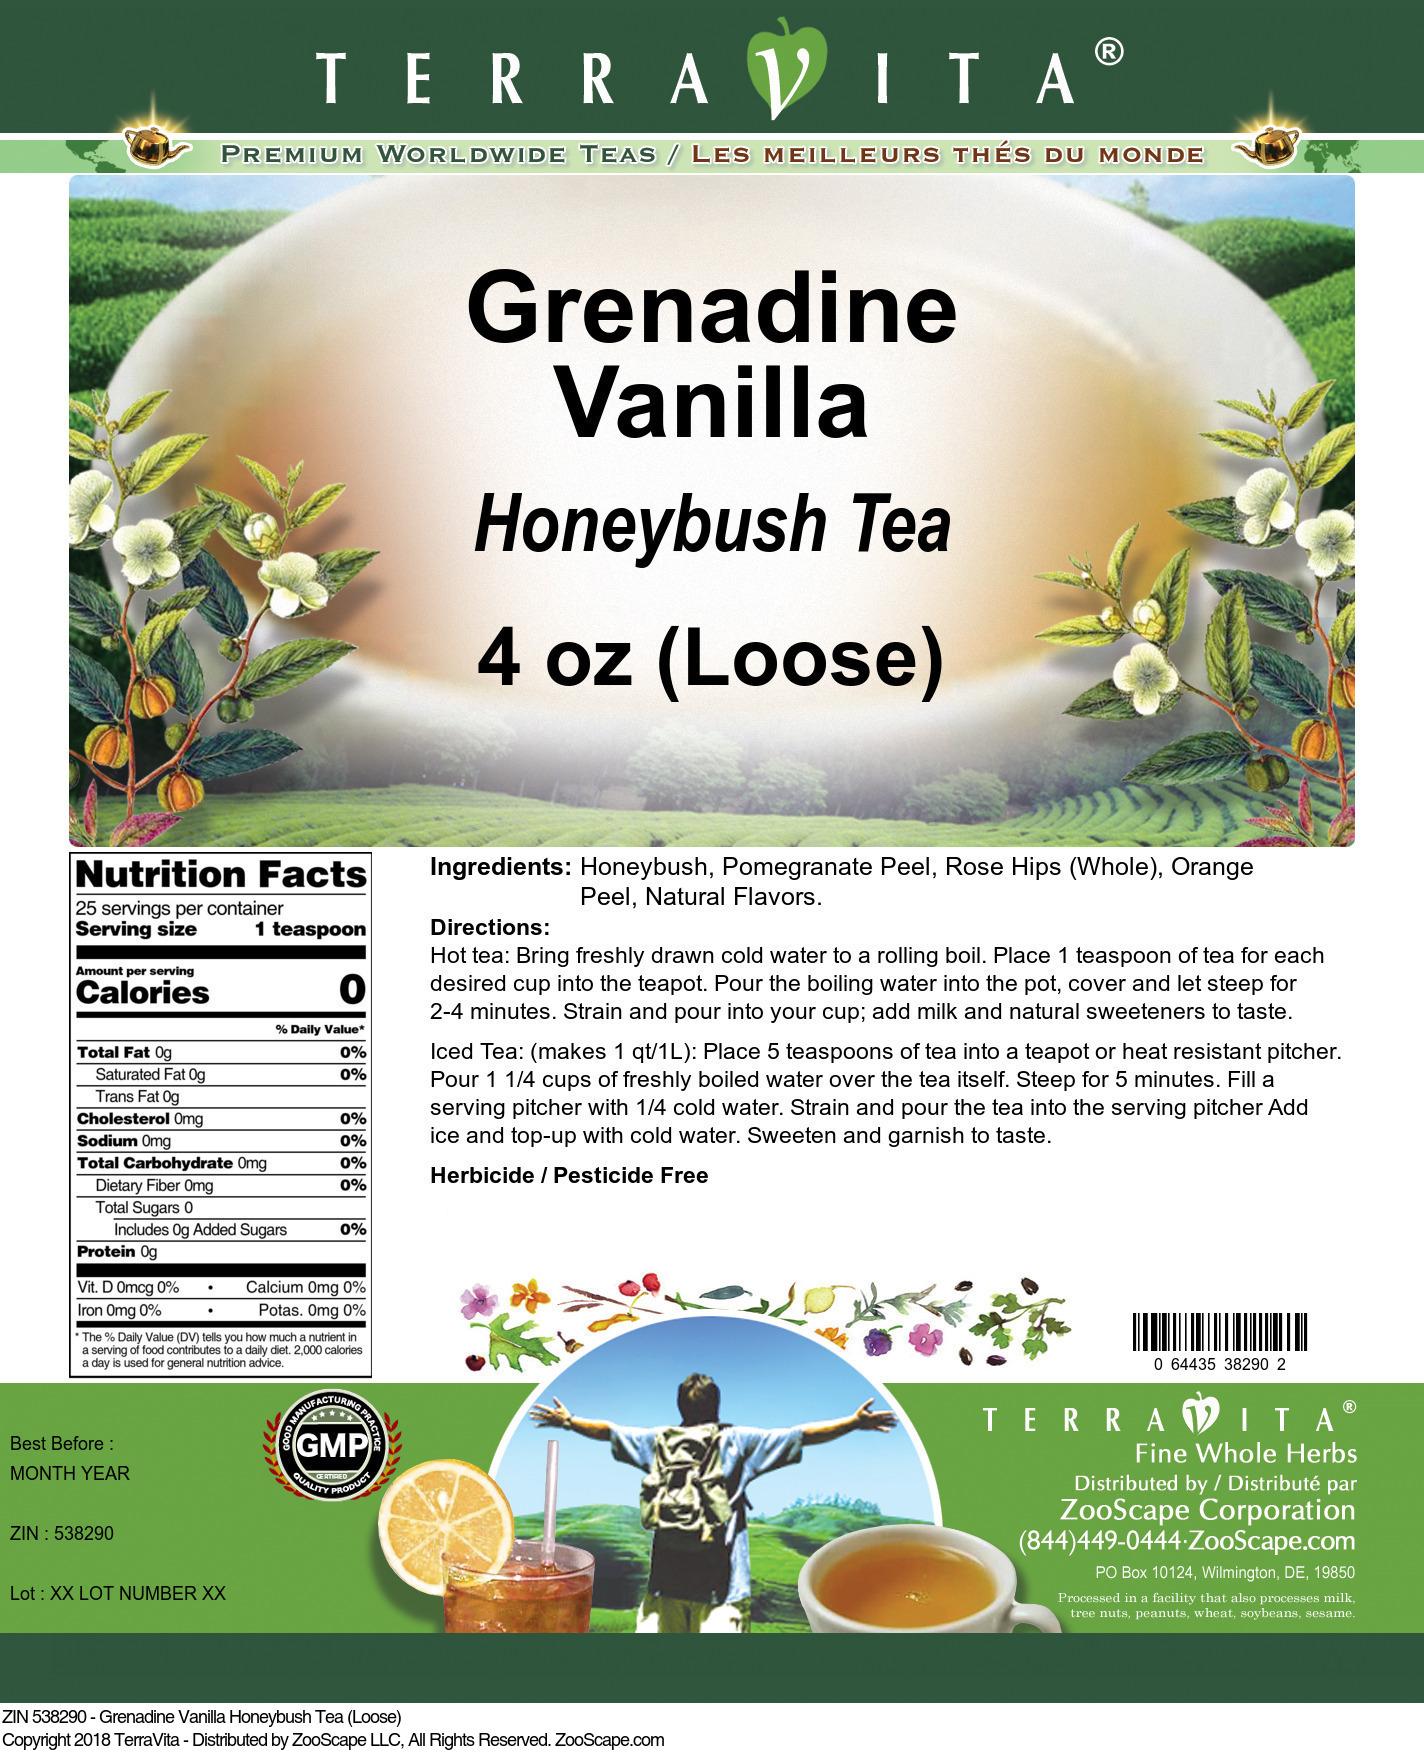 Grenadine Vanilla Honeybush Tea (Loose)